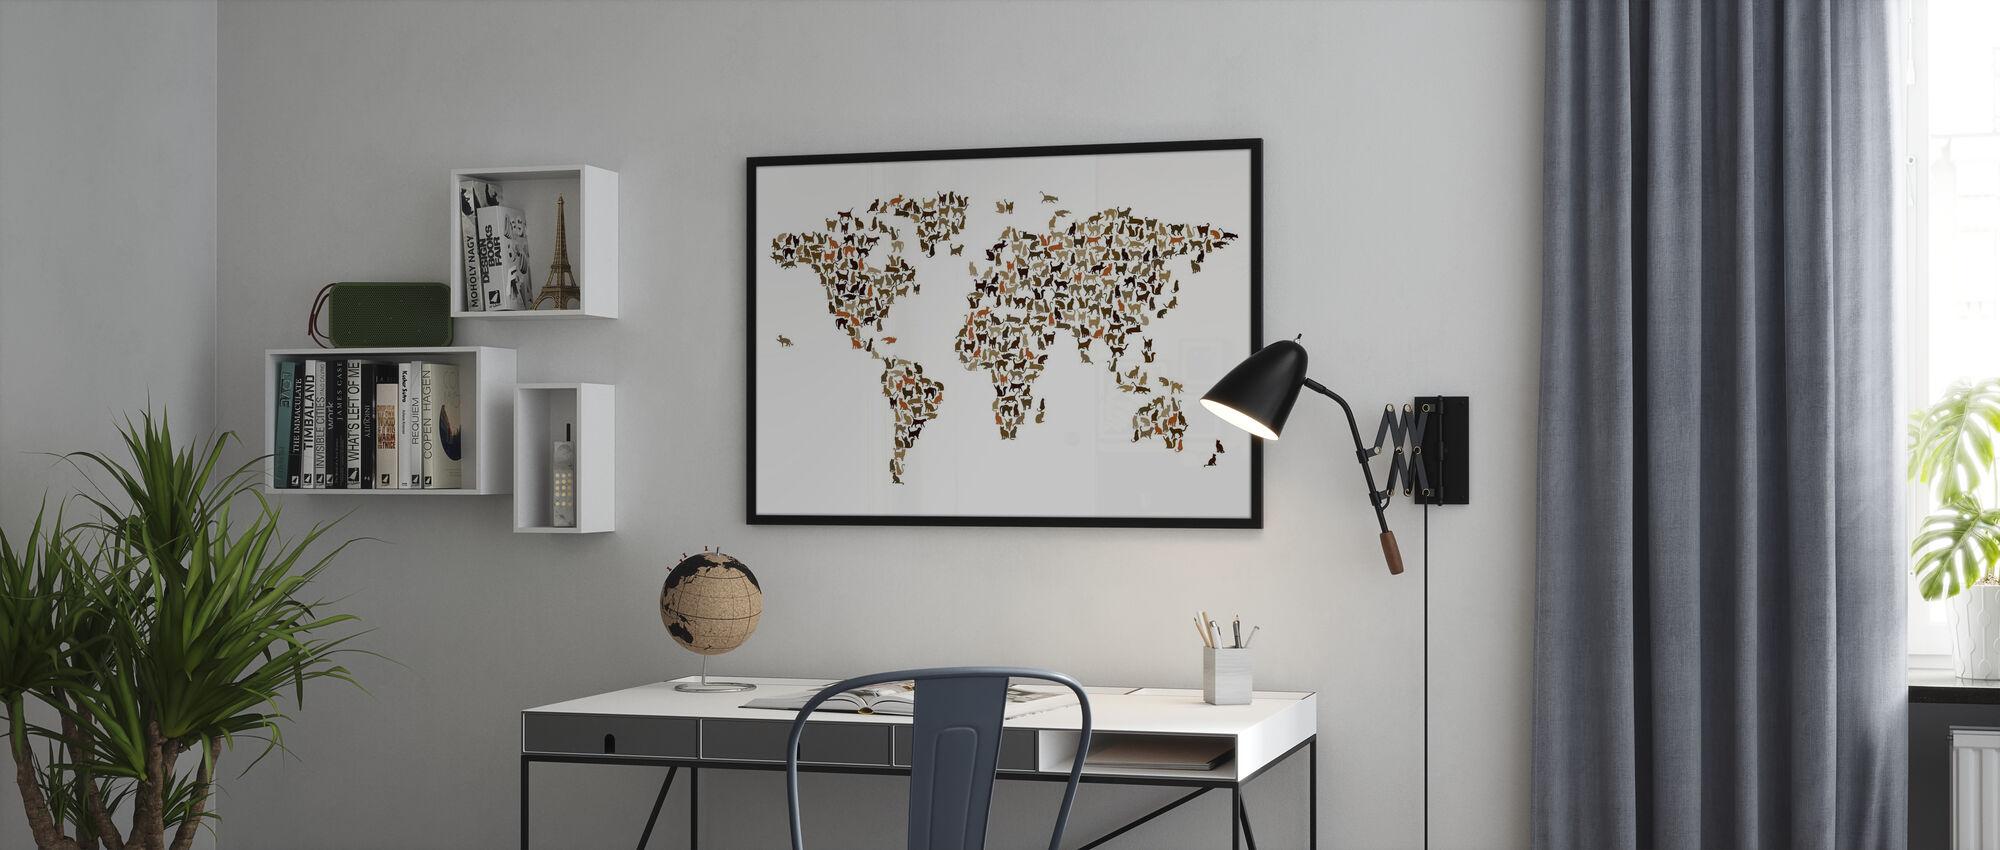 Cats World Map - Framed print - Office